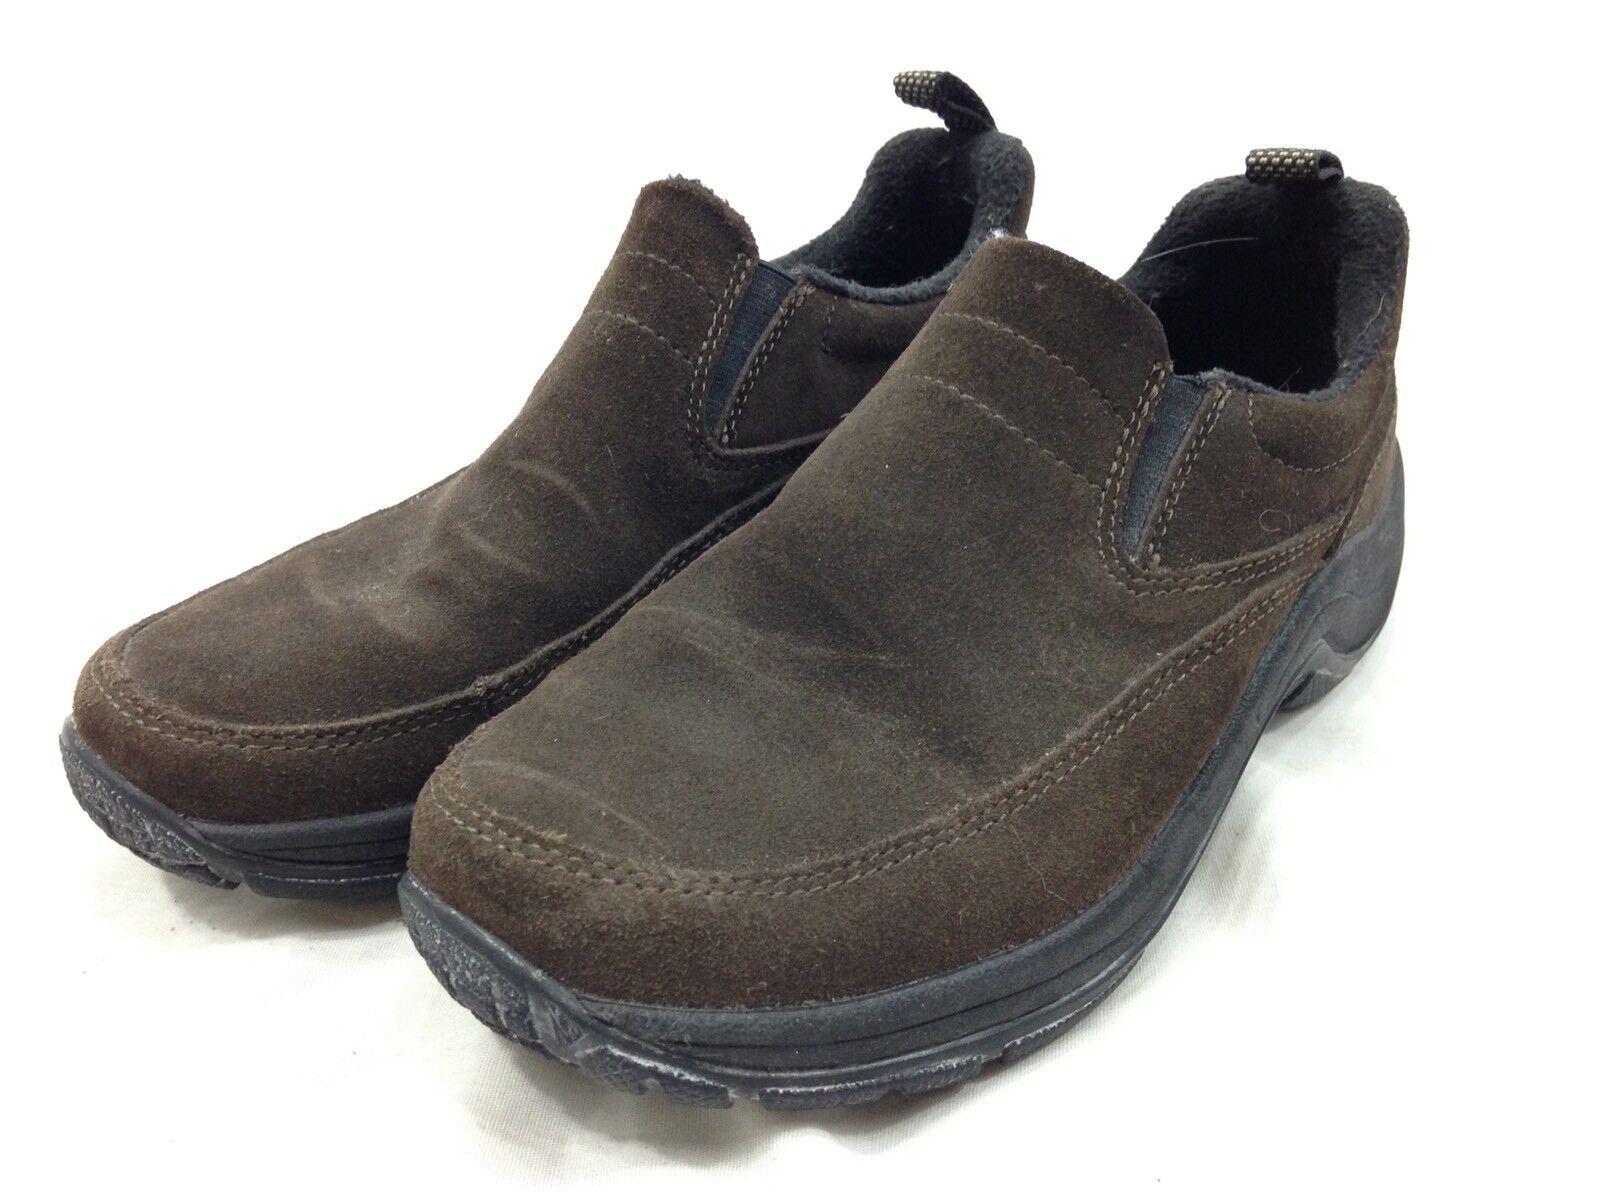 LL Bean shoes Womens 7.5 Brown Suede Moc Mule Slip On Comfort Elastic